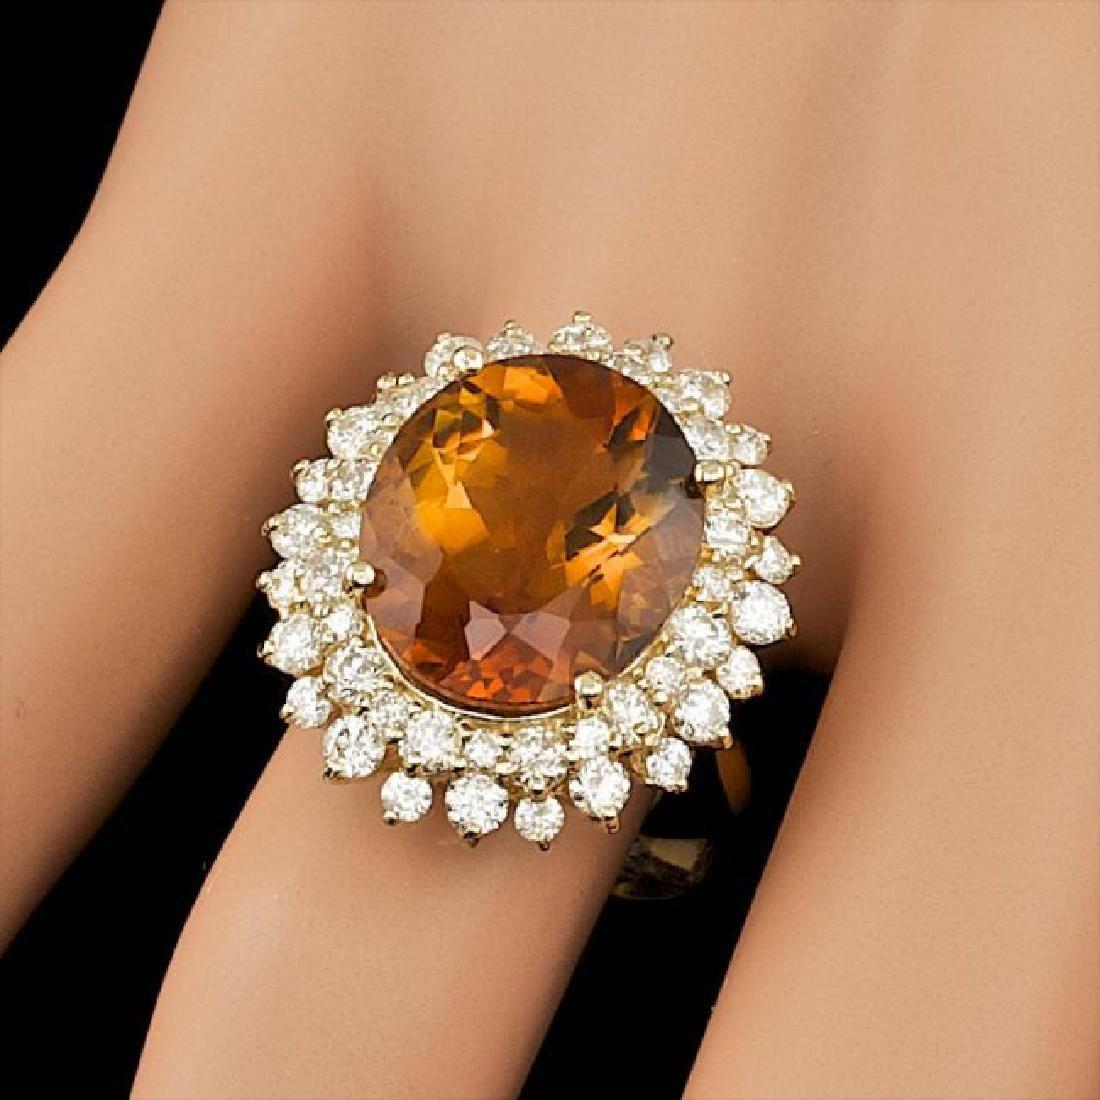 14k Gold 7.00ct Citrine 1.75ct Diamond Ring - 4